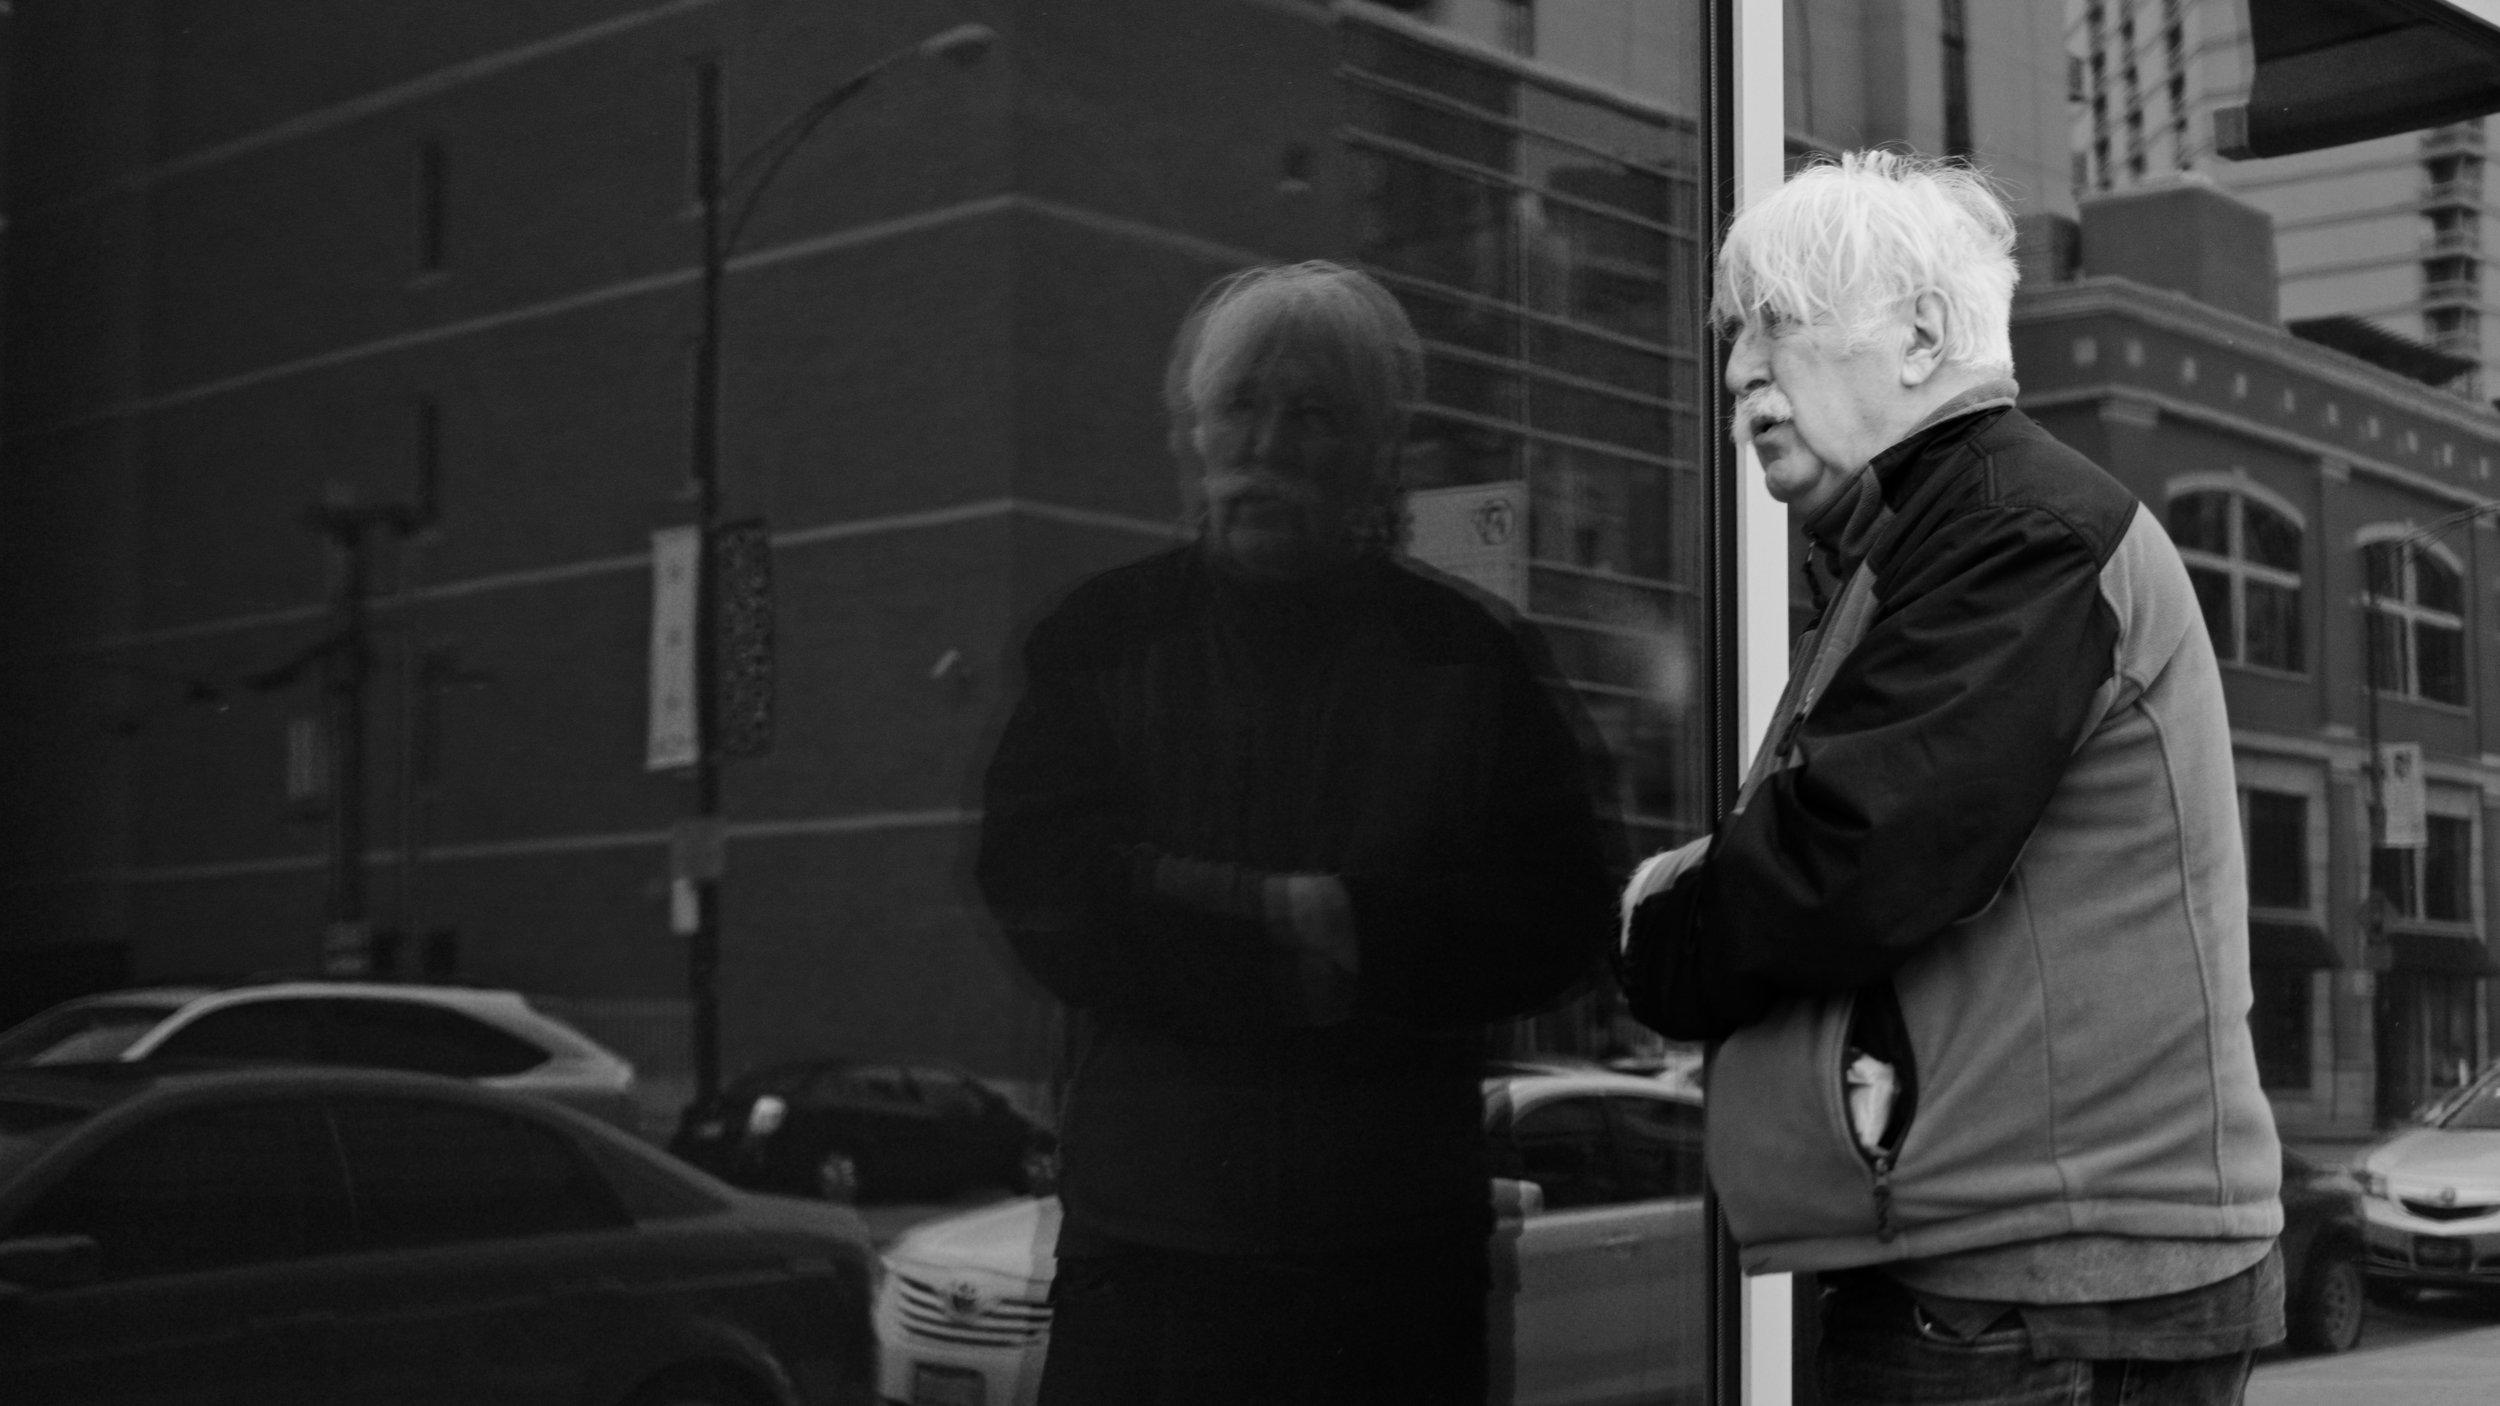 Two Men, Chicago, 3/1/2017